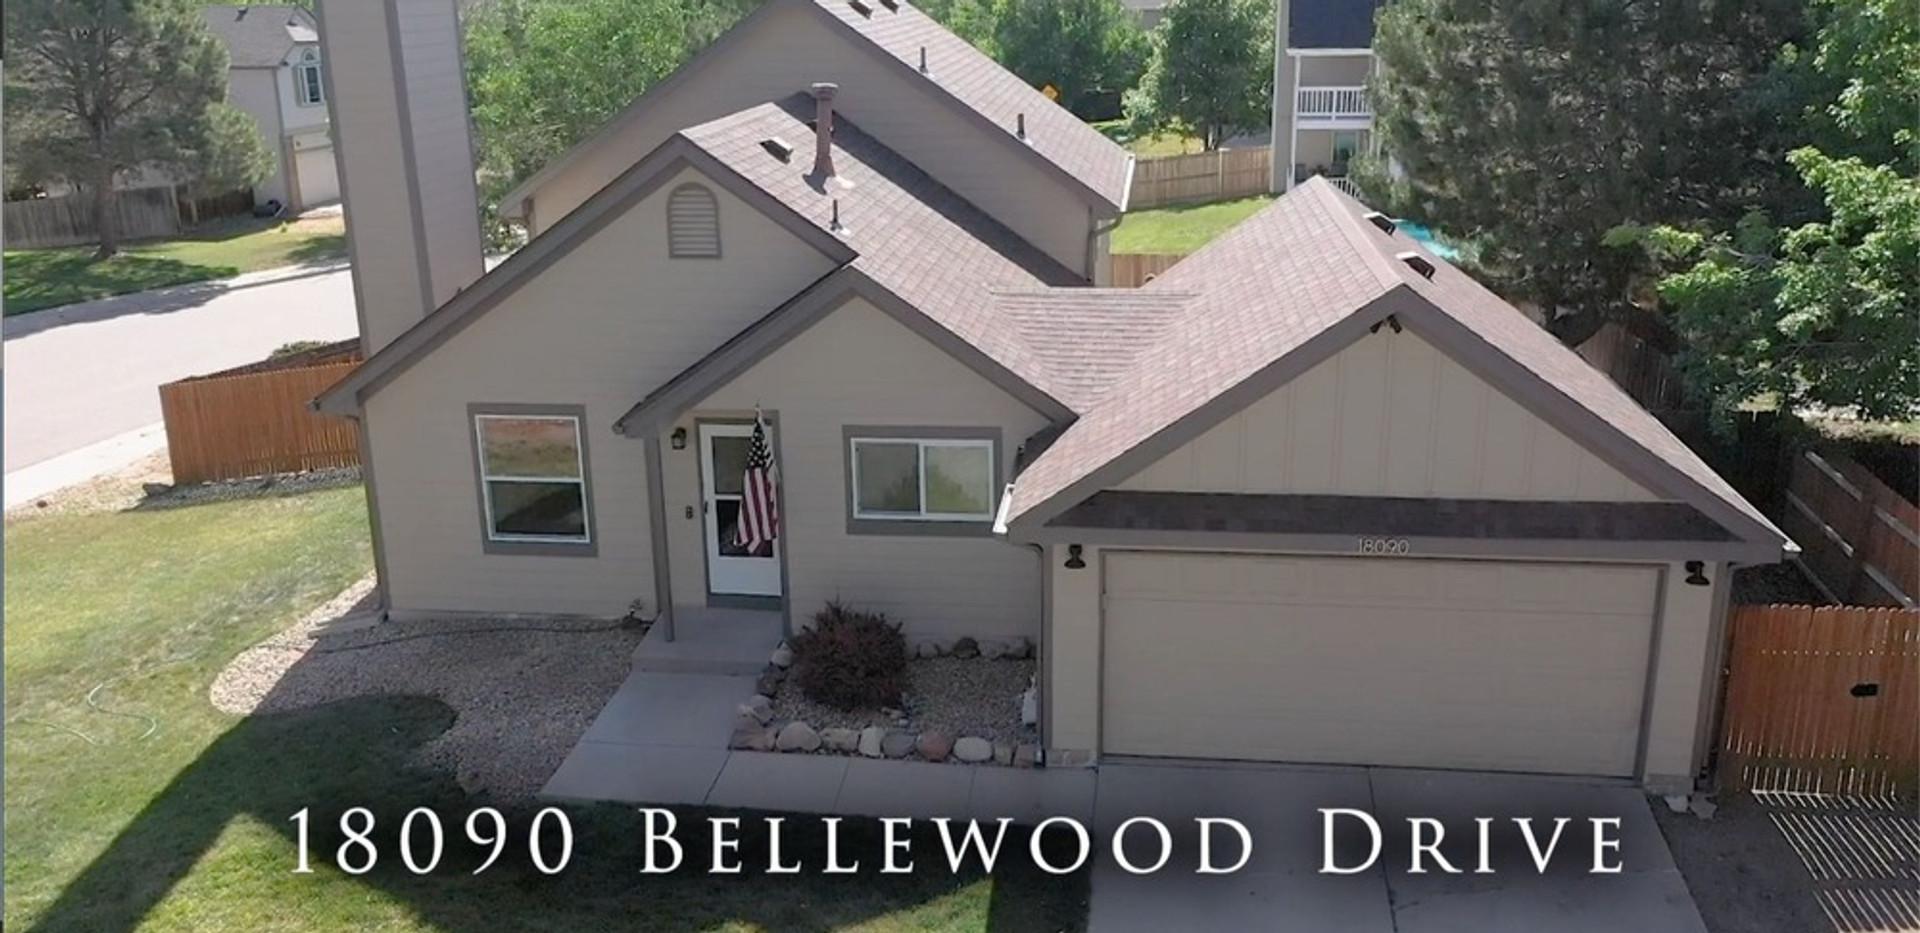 Bellewood - Full.mp4